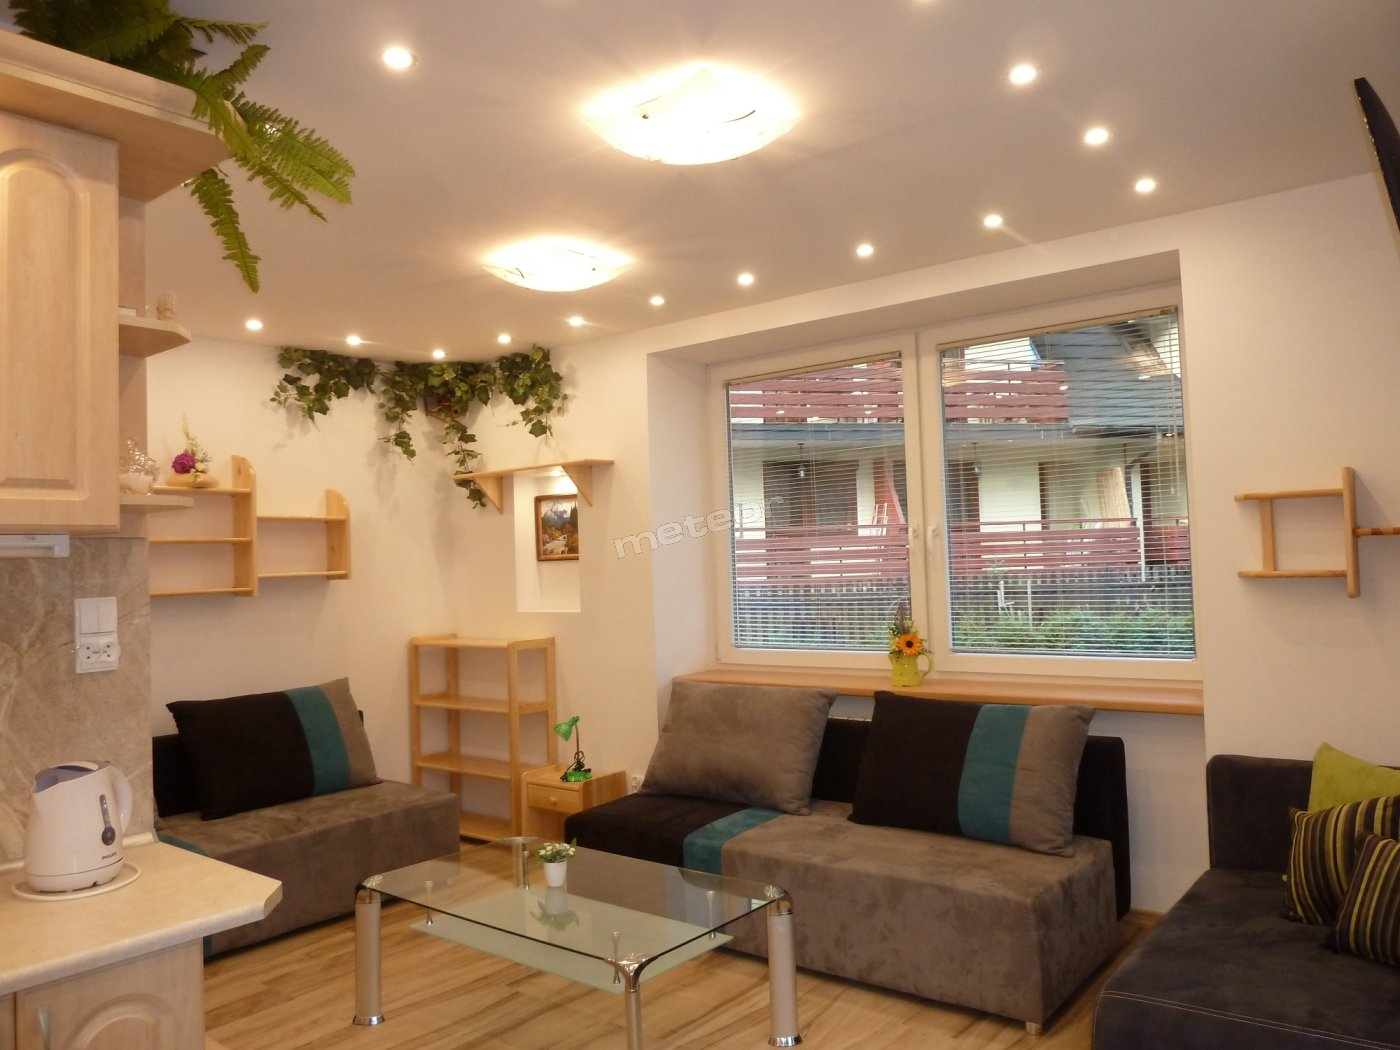 apartament na parterze